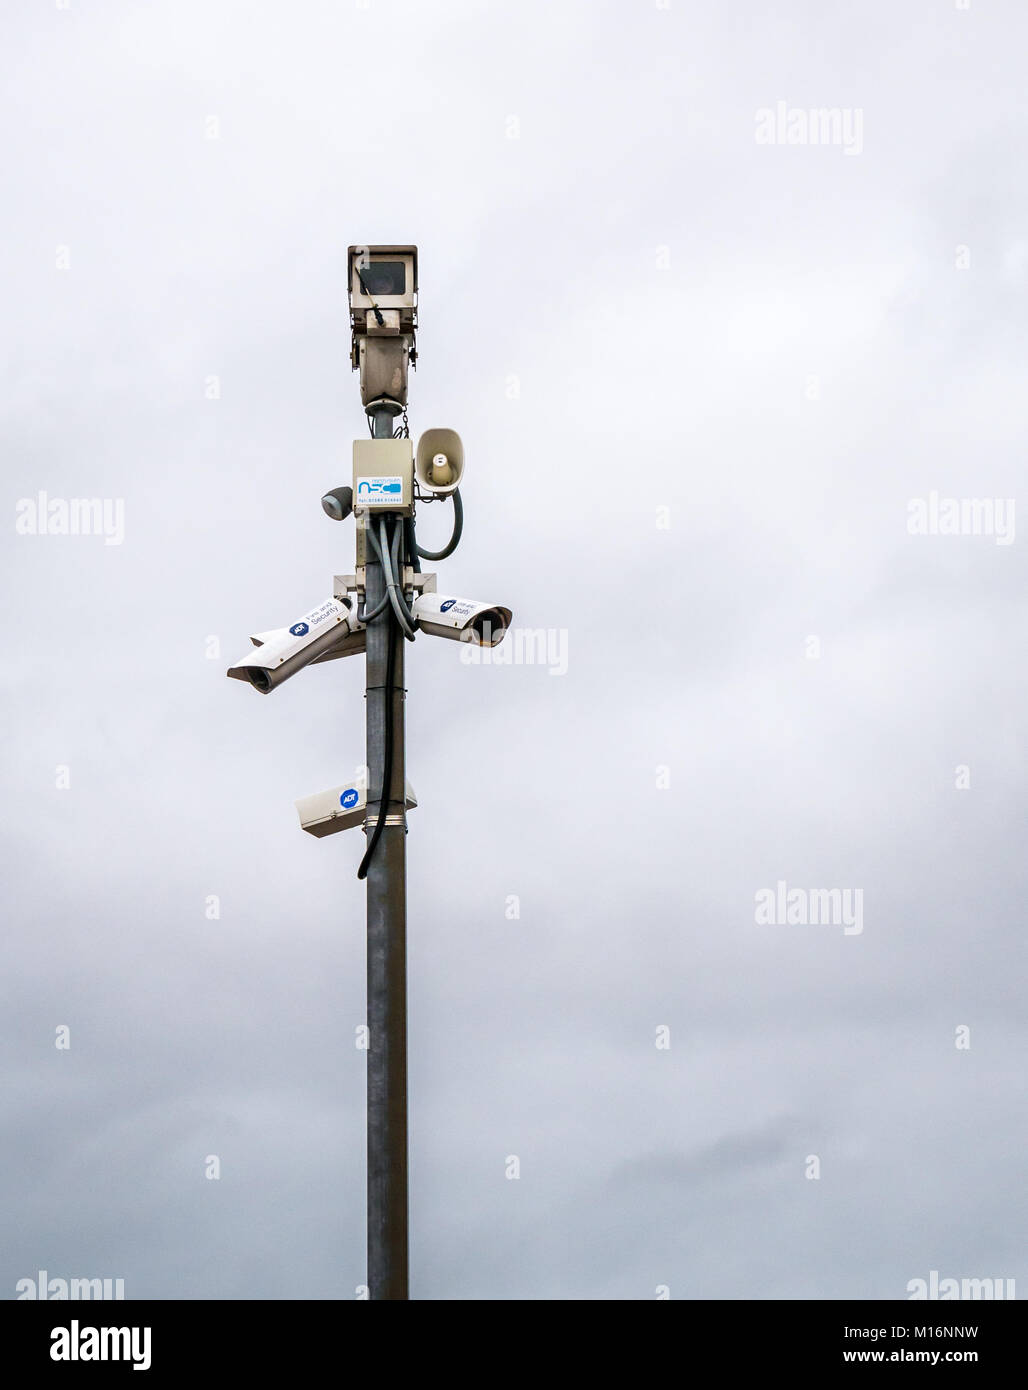 CCTV cameras and sound horn, Network Rail, Drem train station, East Lothian, Scotland, UK - Stock Image